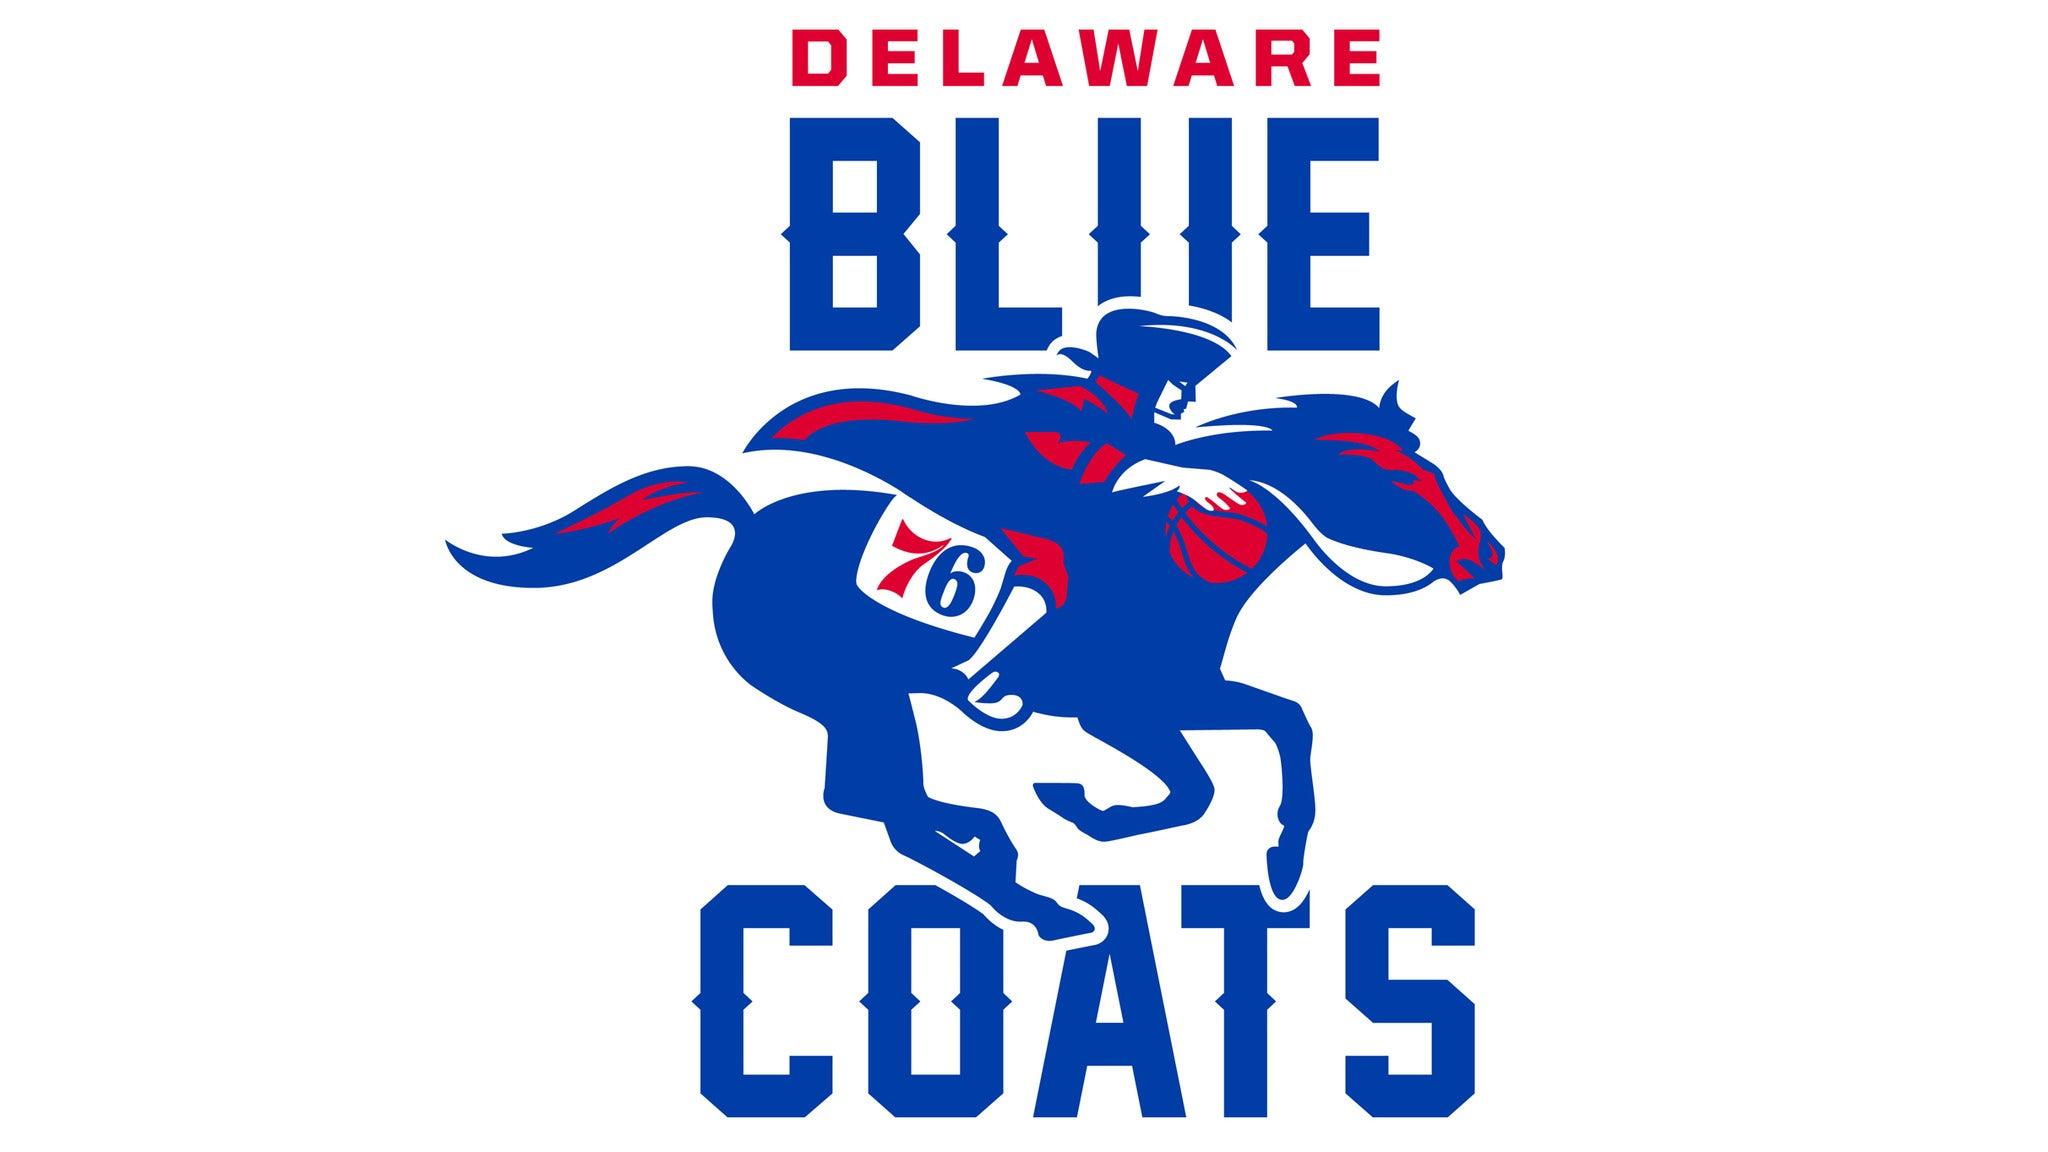 Delaware 87ers vs. Oklahoma City Blue